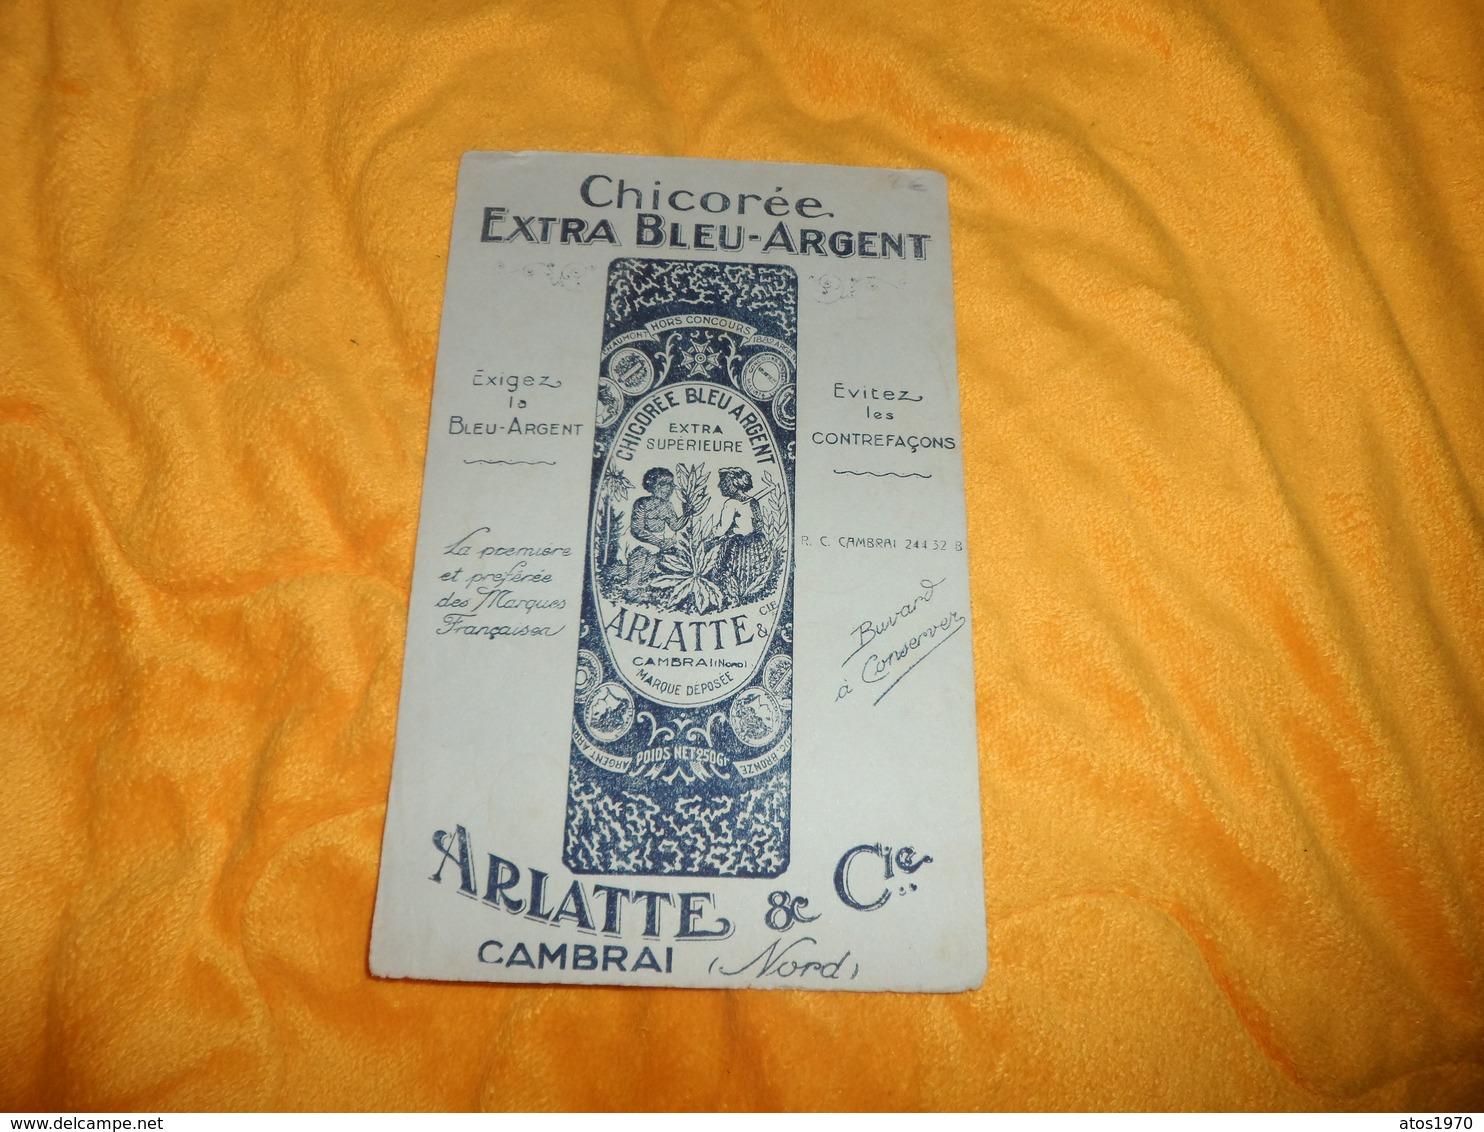 BUVARD ANCIEN CHICOREE EXTRA BLEU ARGENT ARLATTE & CIE CAMBRAI.. - Buvards, Protège-cahiers Illustrés